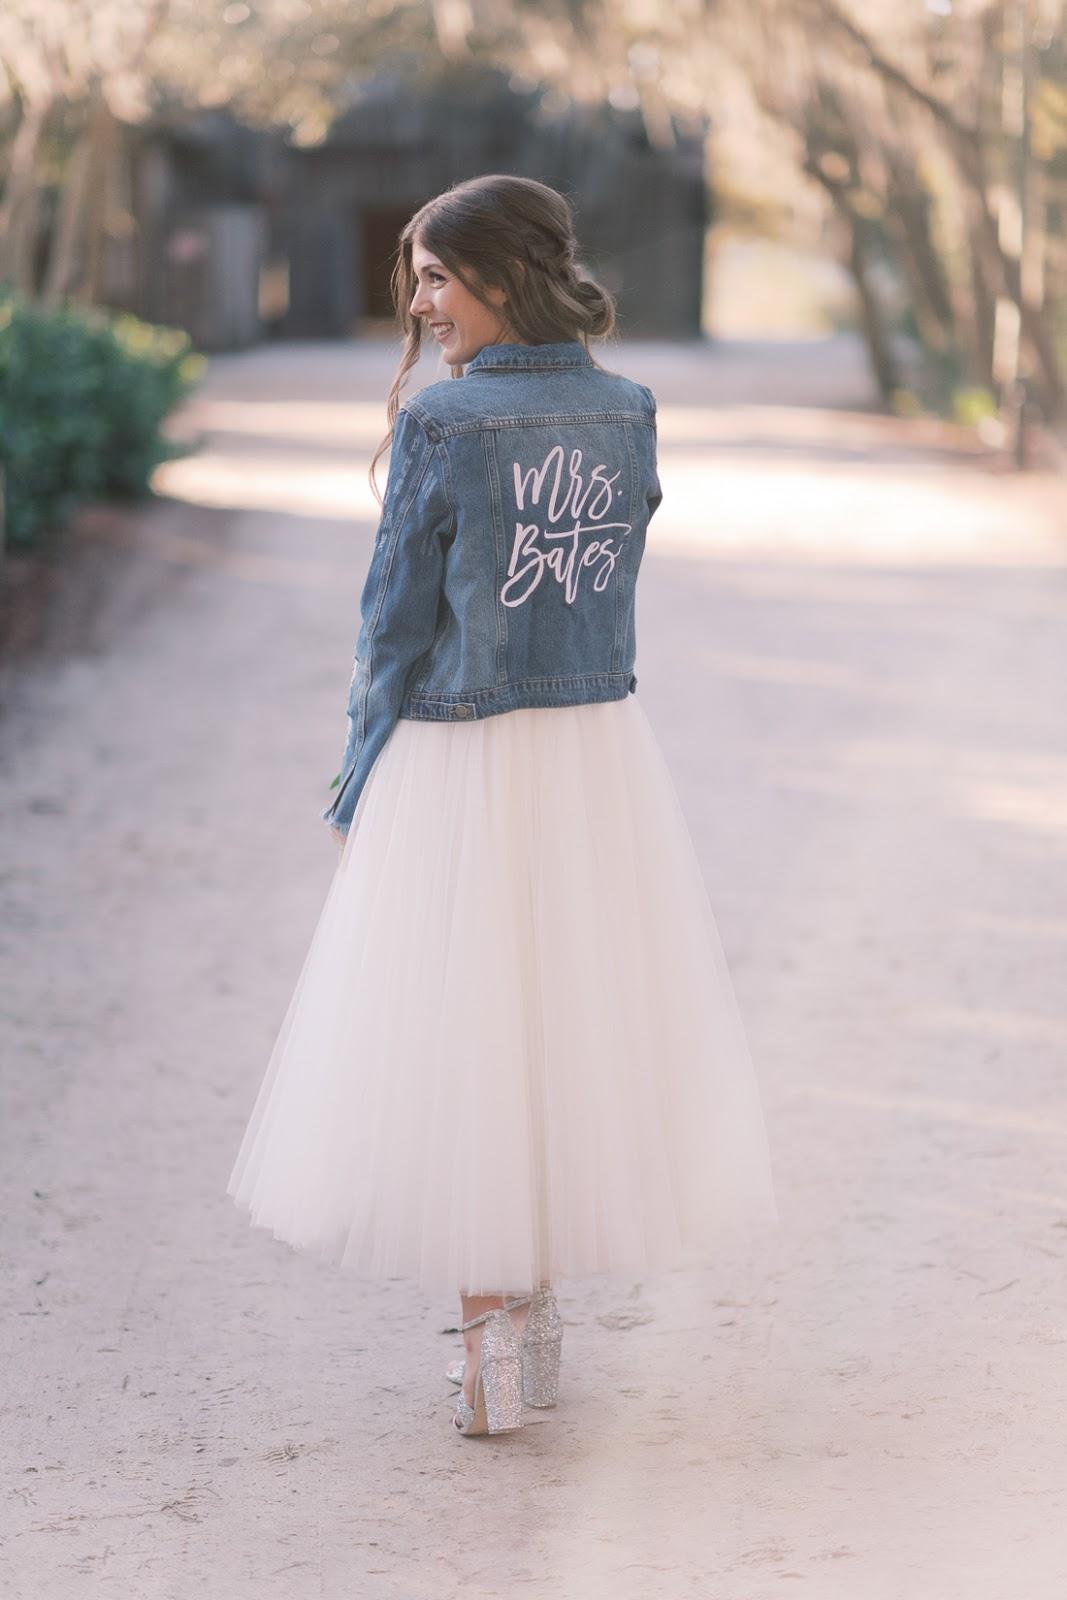 Personalized Denim Jacket Wedding - Chasing Cinderella